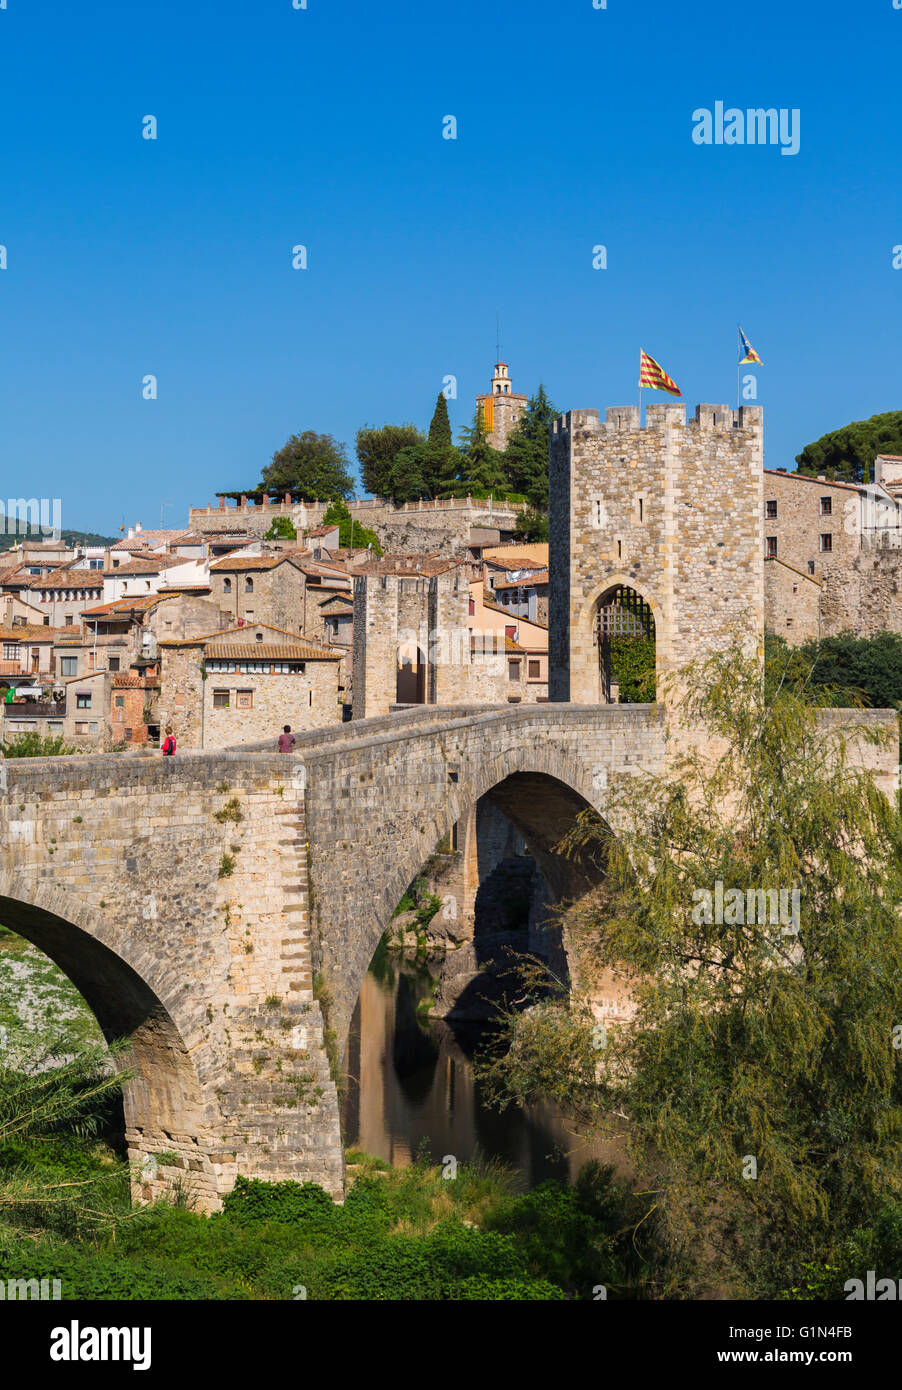 Besalú, Provinz Girona, Katalonien, Spanien.  Befestigte Brücke, bekannt als El Pont Vell, die alte Brücke Stockbild